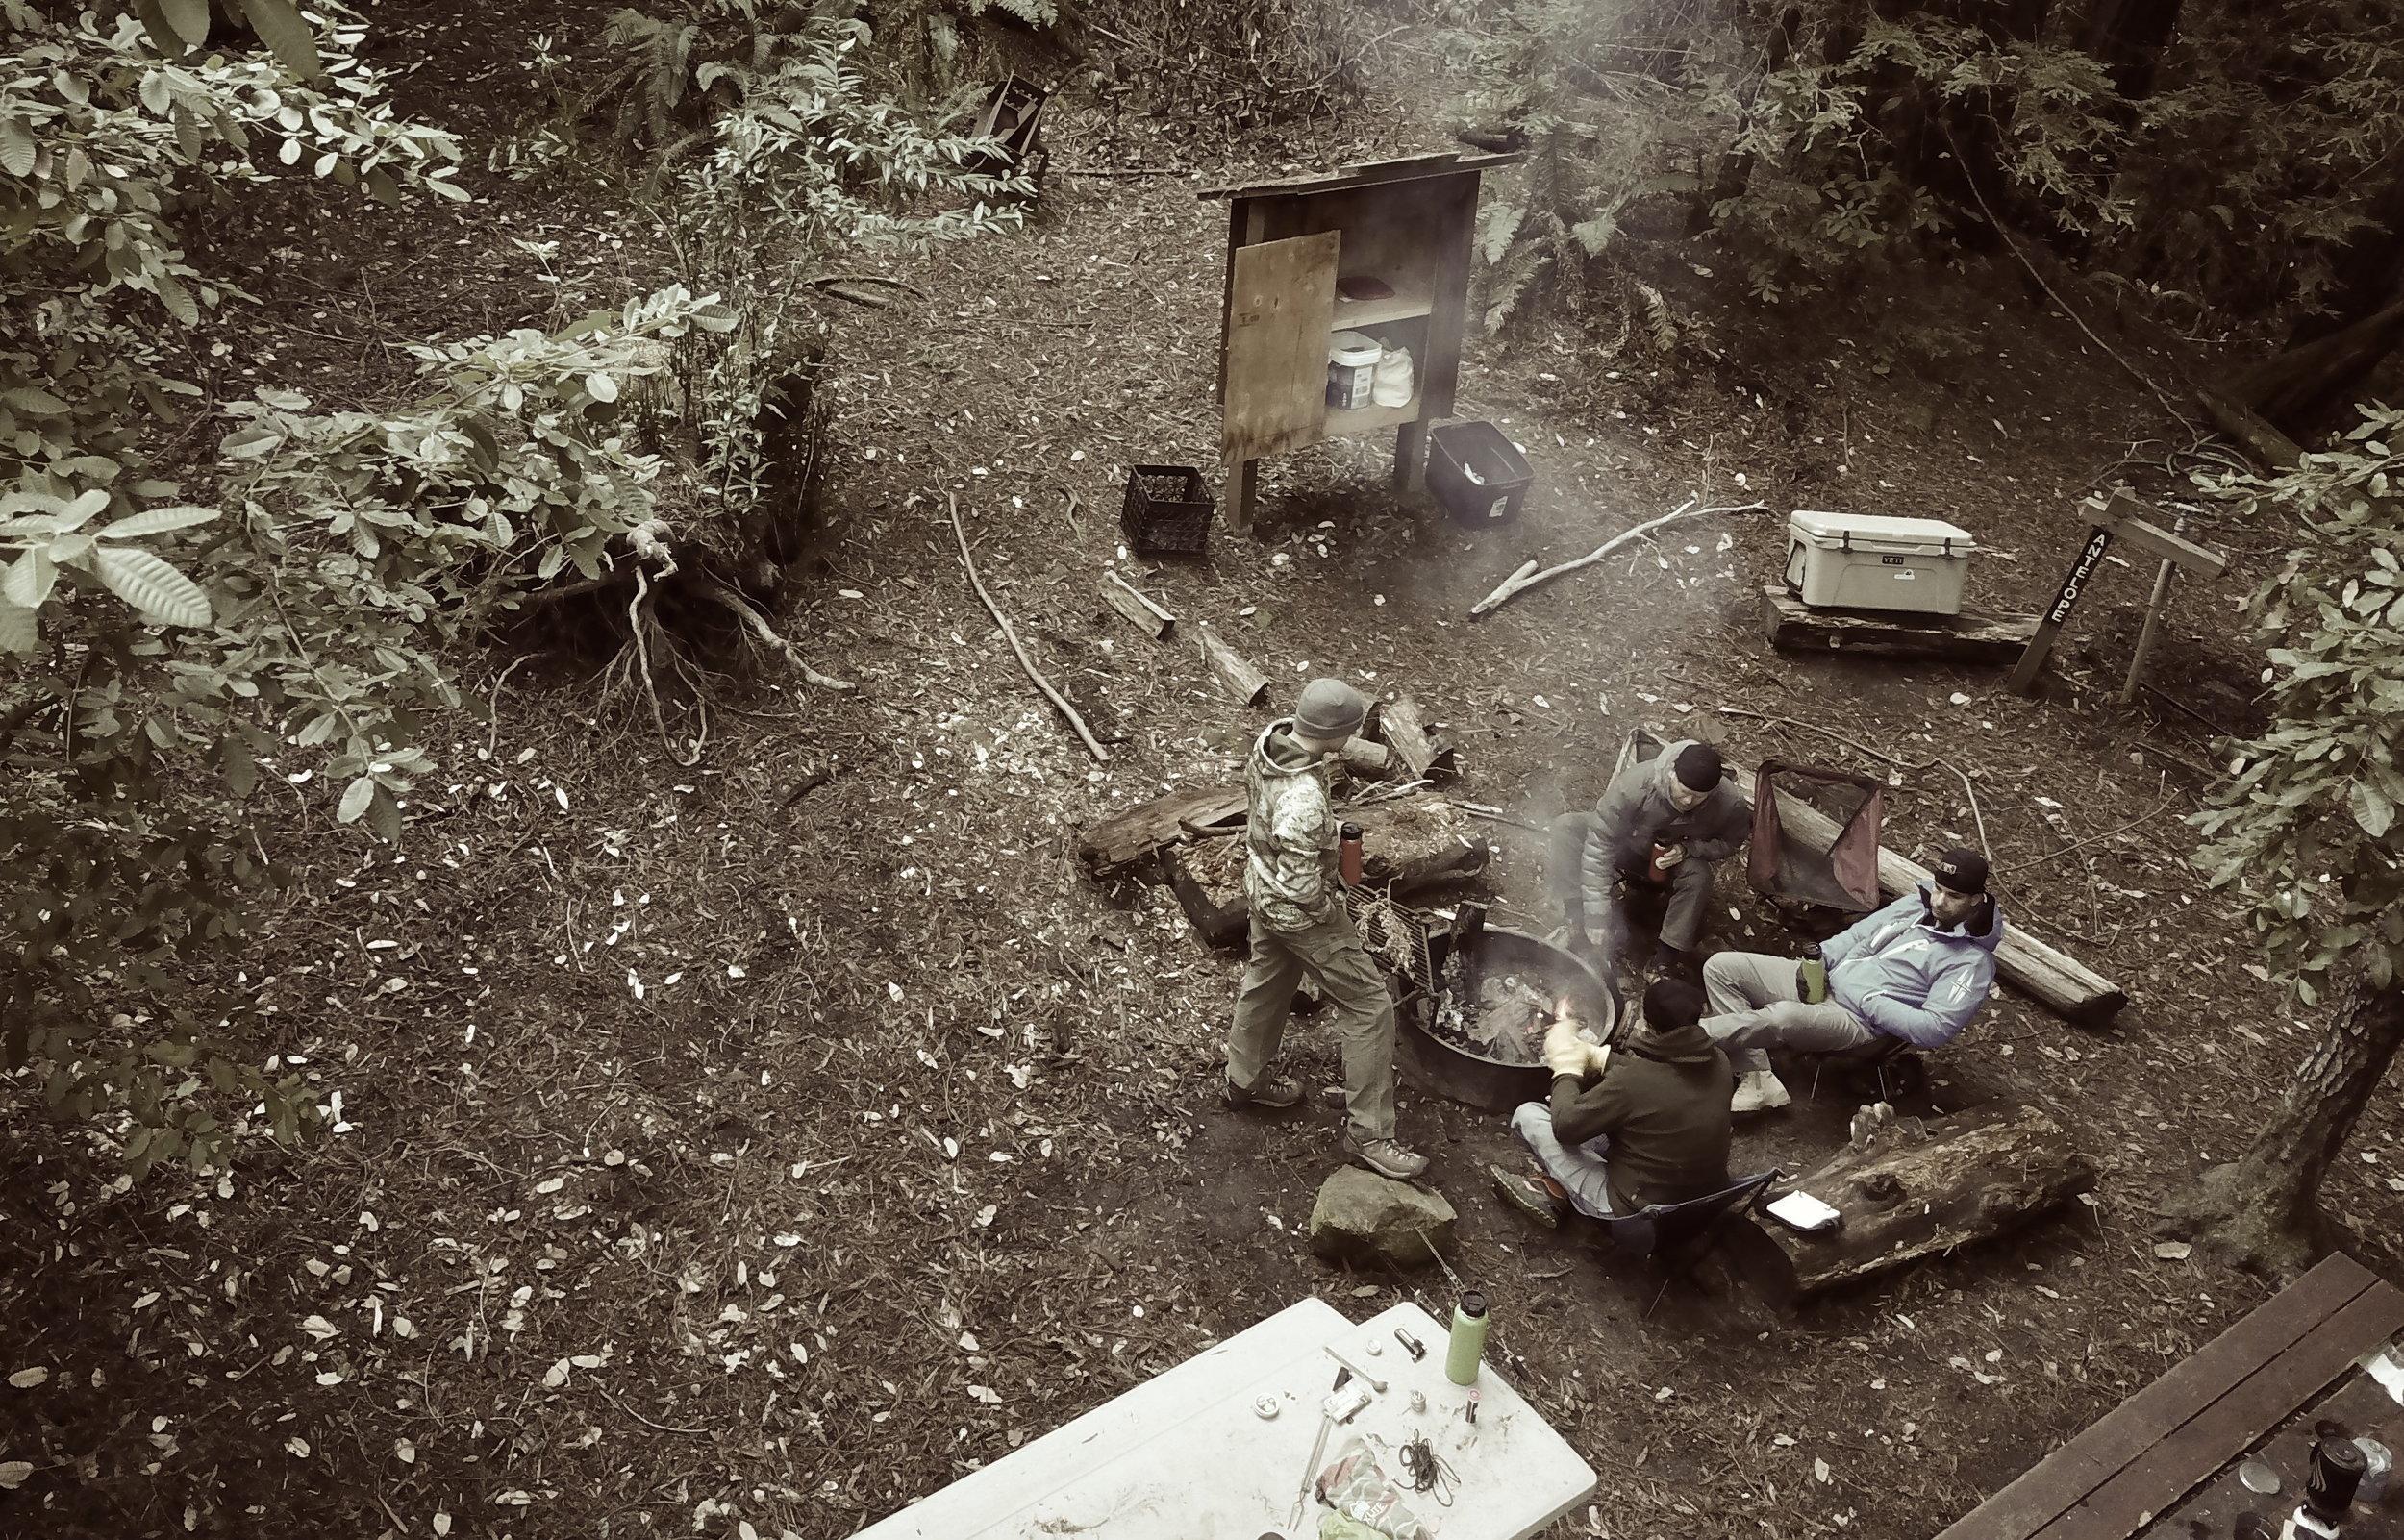 HQ forest fire STG 001  Land Excursion Eric Bill Joe Pat Camp DJI_0034DJI_0032 (1) (1).JPG